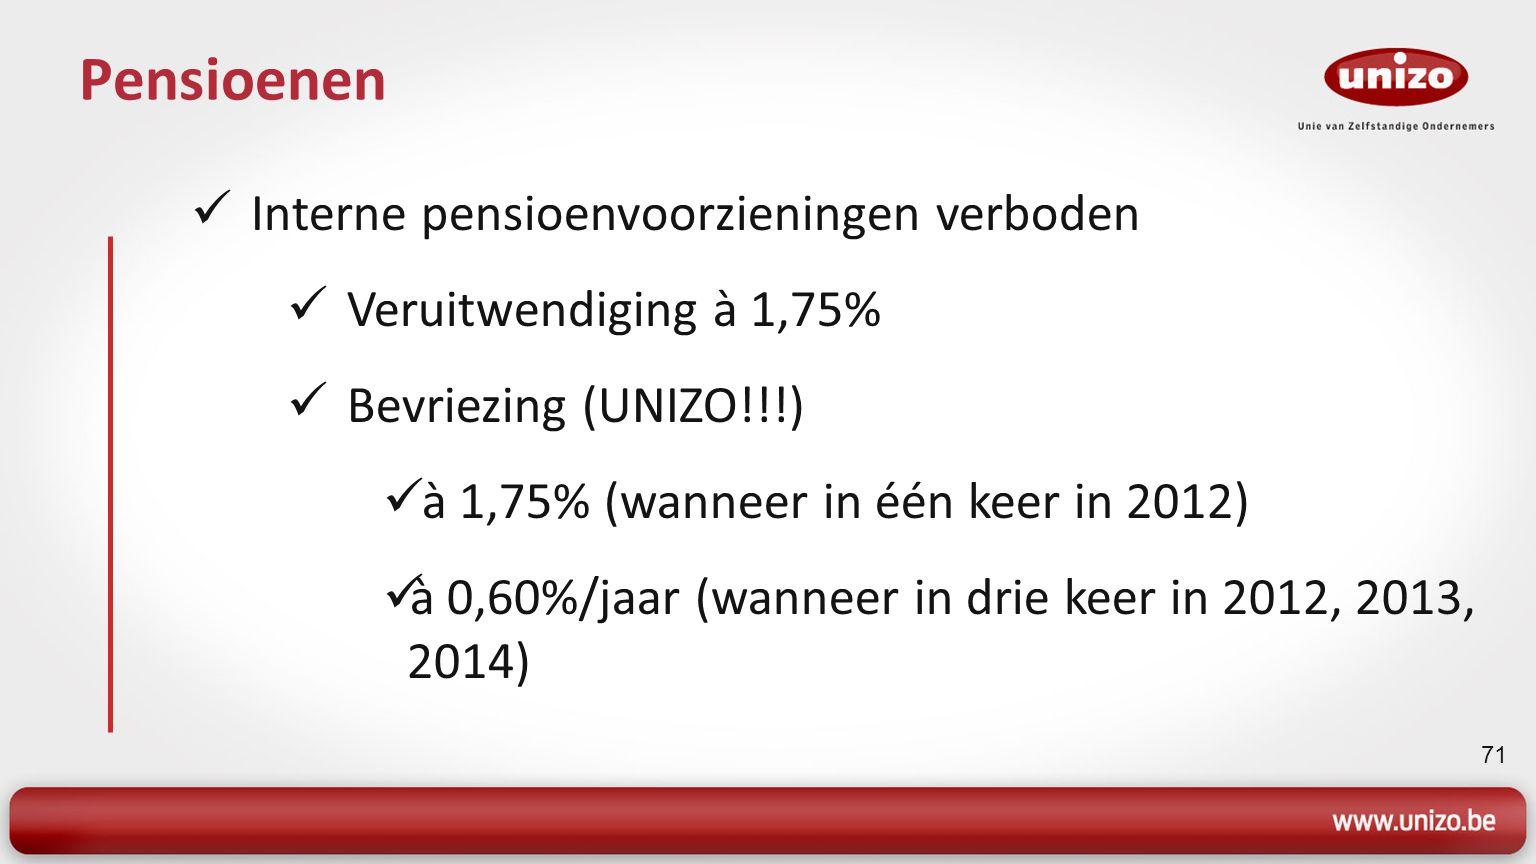 71 Pensioenen Interne pensioenvoorzieningen verboden Veruitwendiging à 1,75% Bevriezing (UNIZO!!!) à 1,75% (wanneer in één keer in 2012) à 0,60%/jaar (wanneer in drie keer in 2012, 2013, 2014)